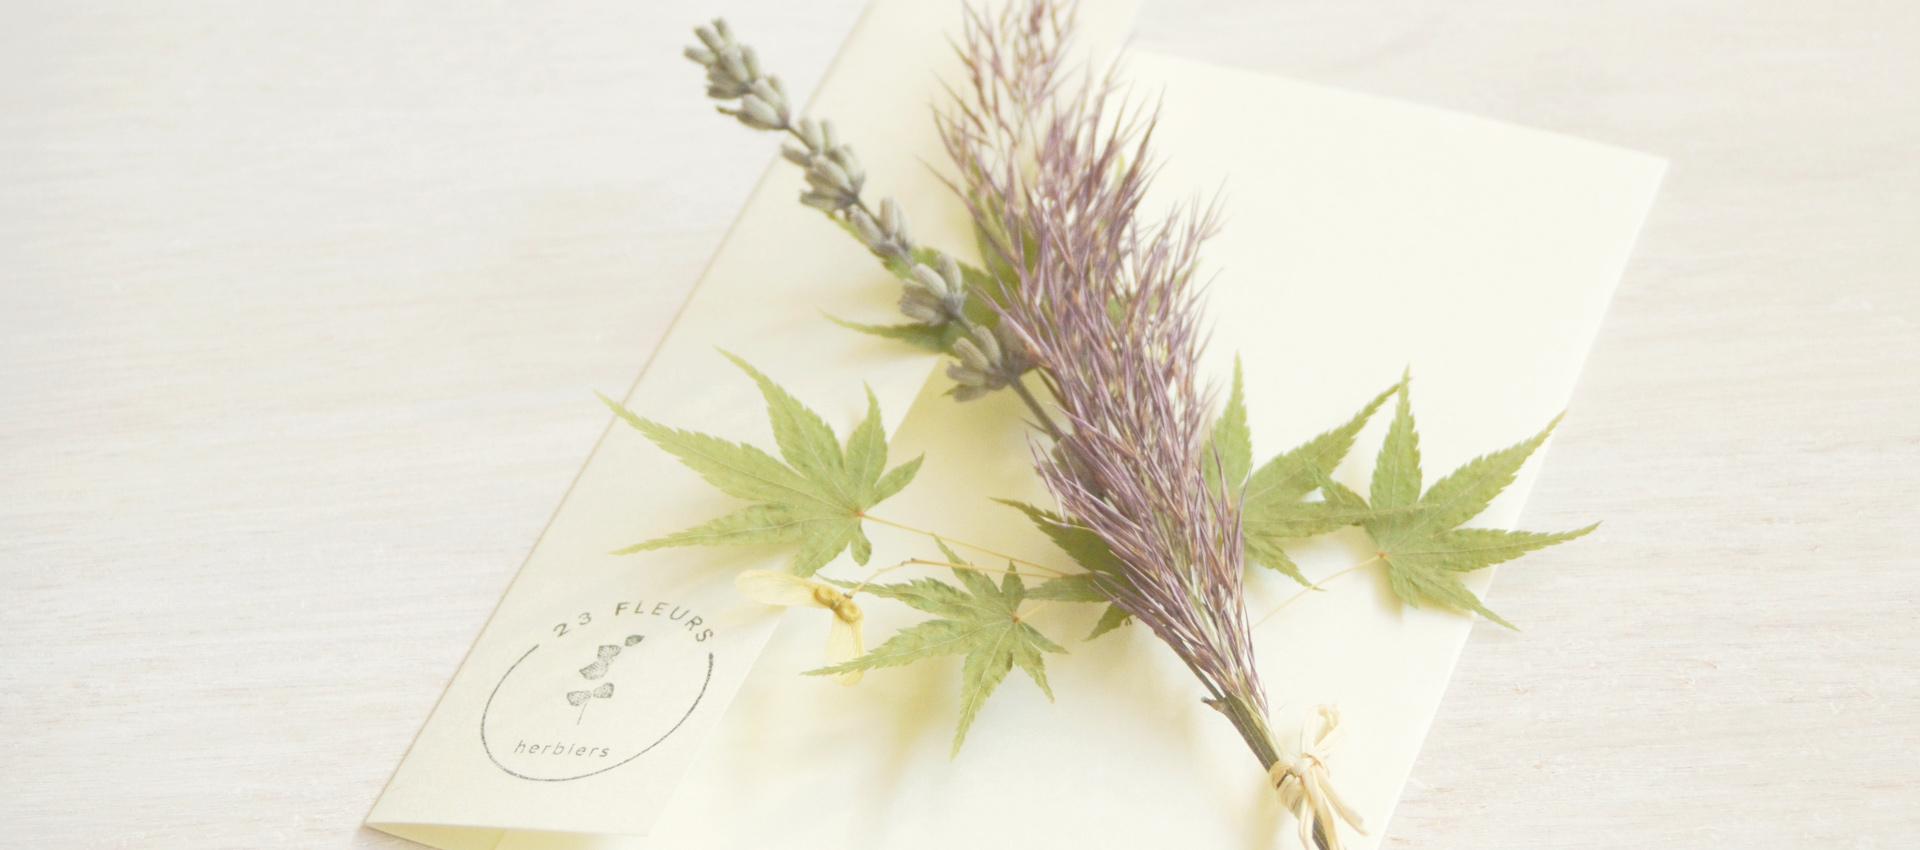 23janvier_home_flex_bouquet_offert_02_1920x850_23janvier